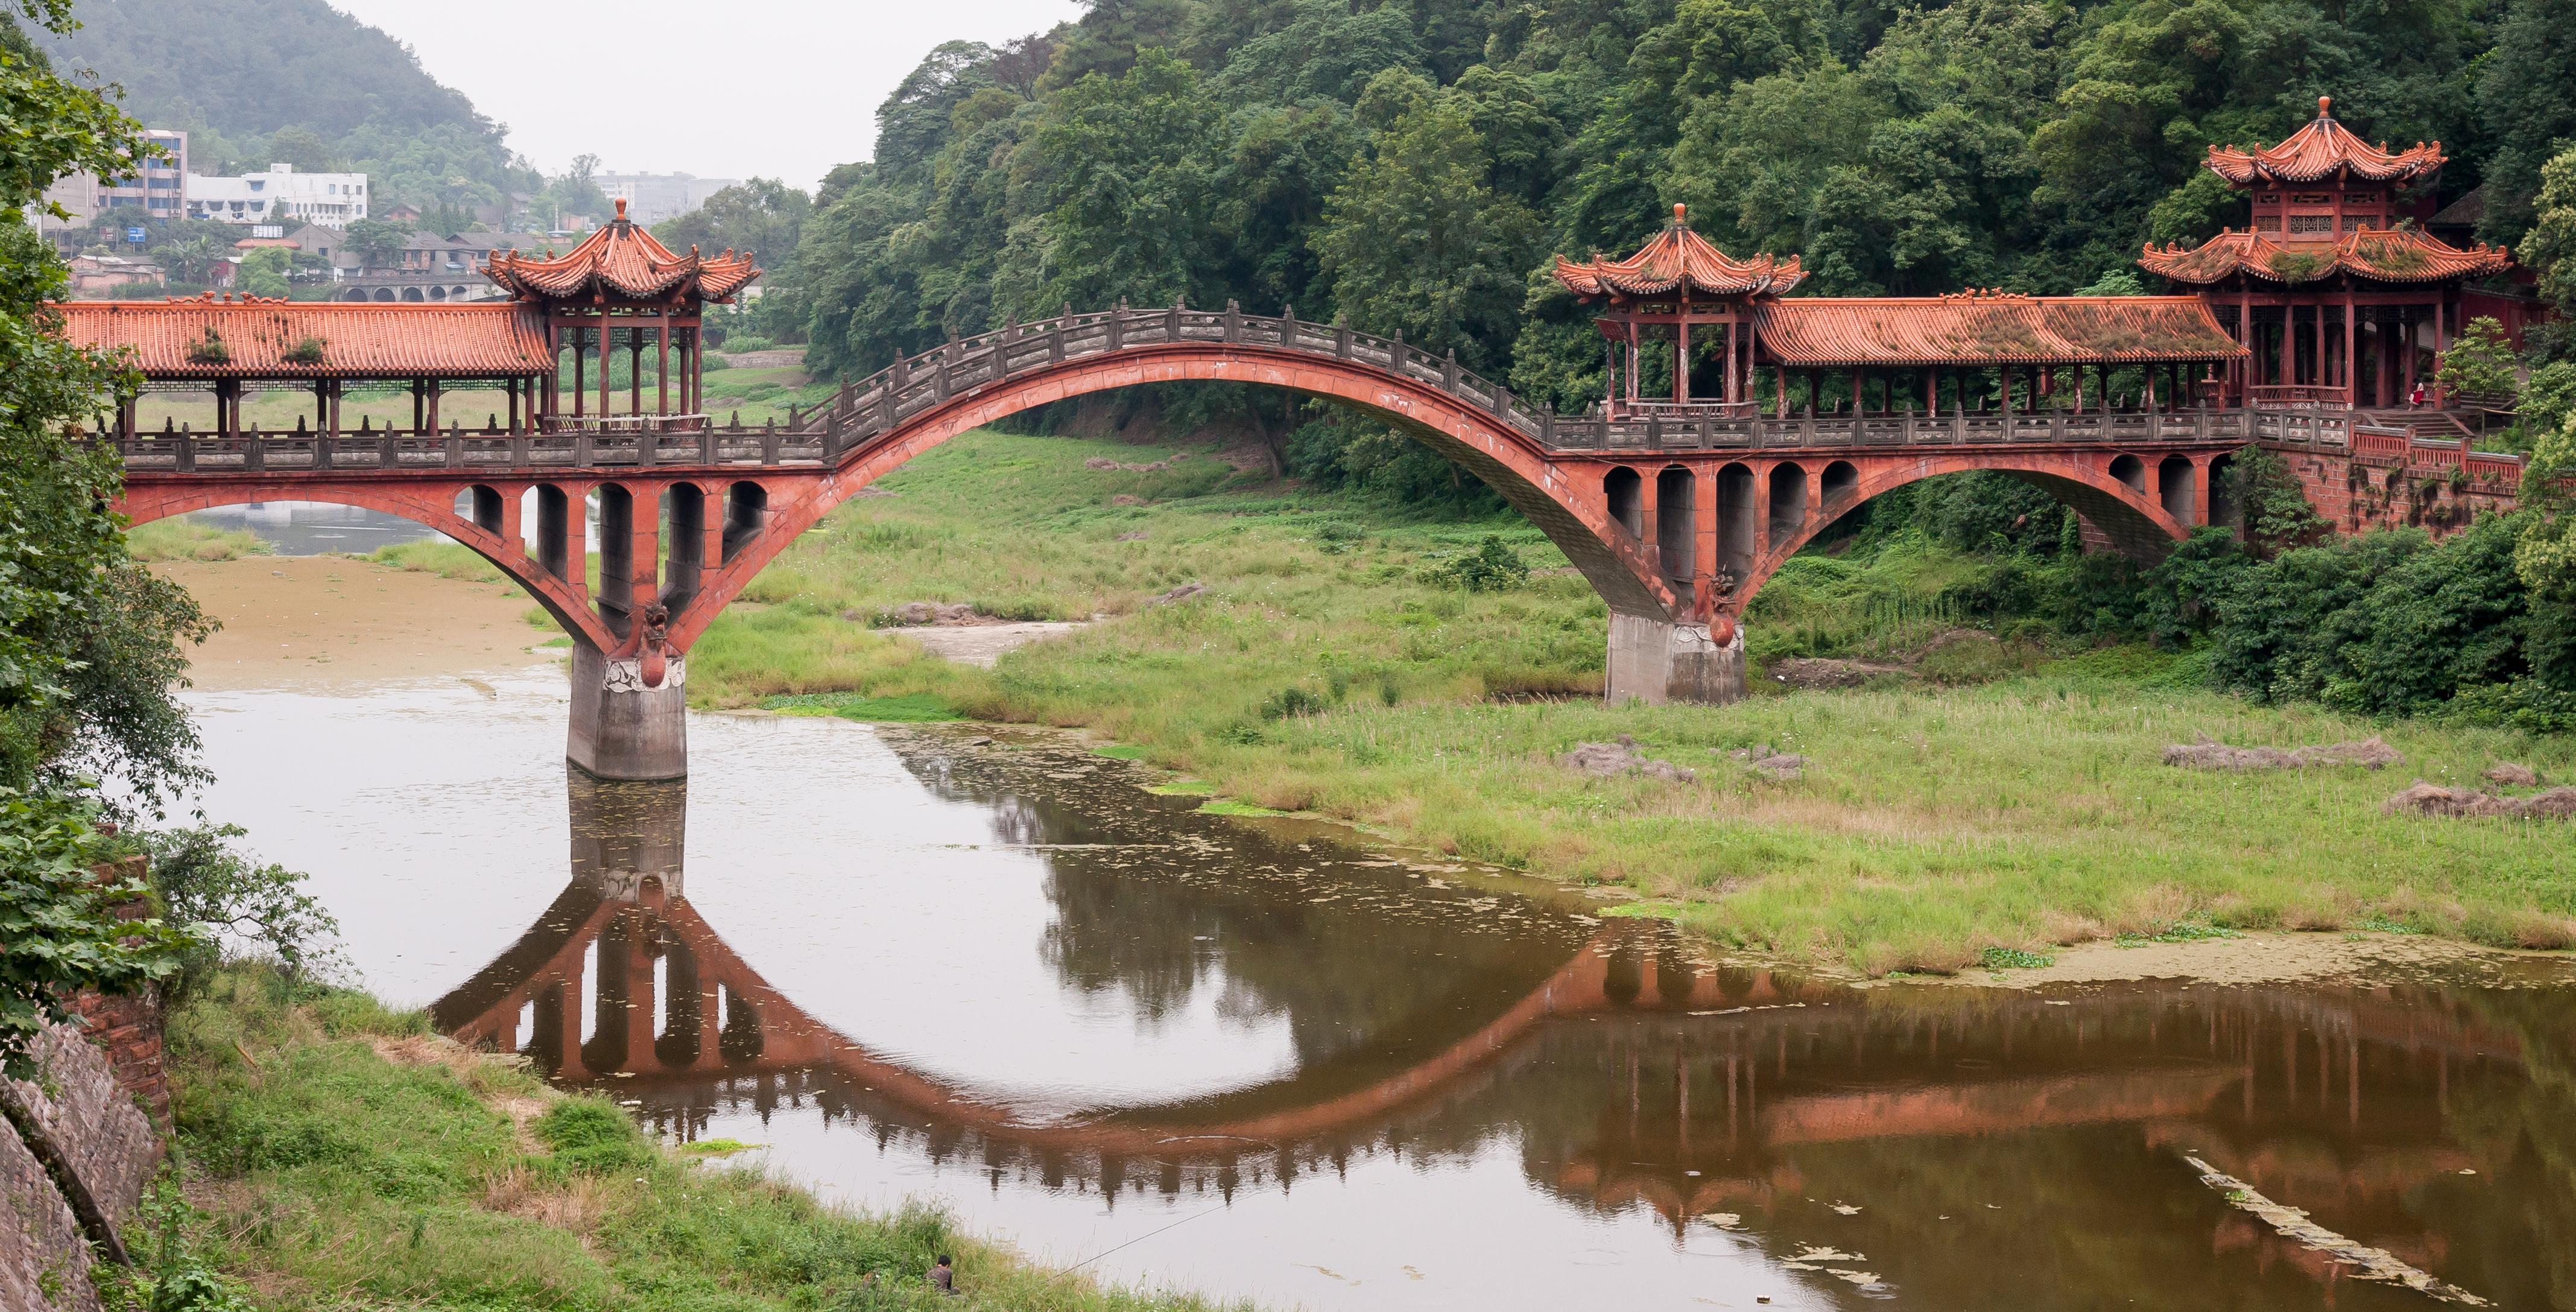 Leshan China  city photos gallery : the old stone arch bridge at leshan china